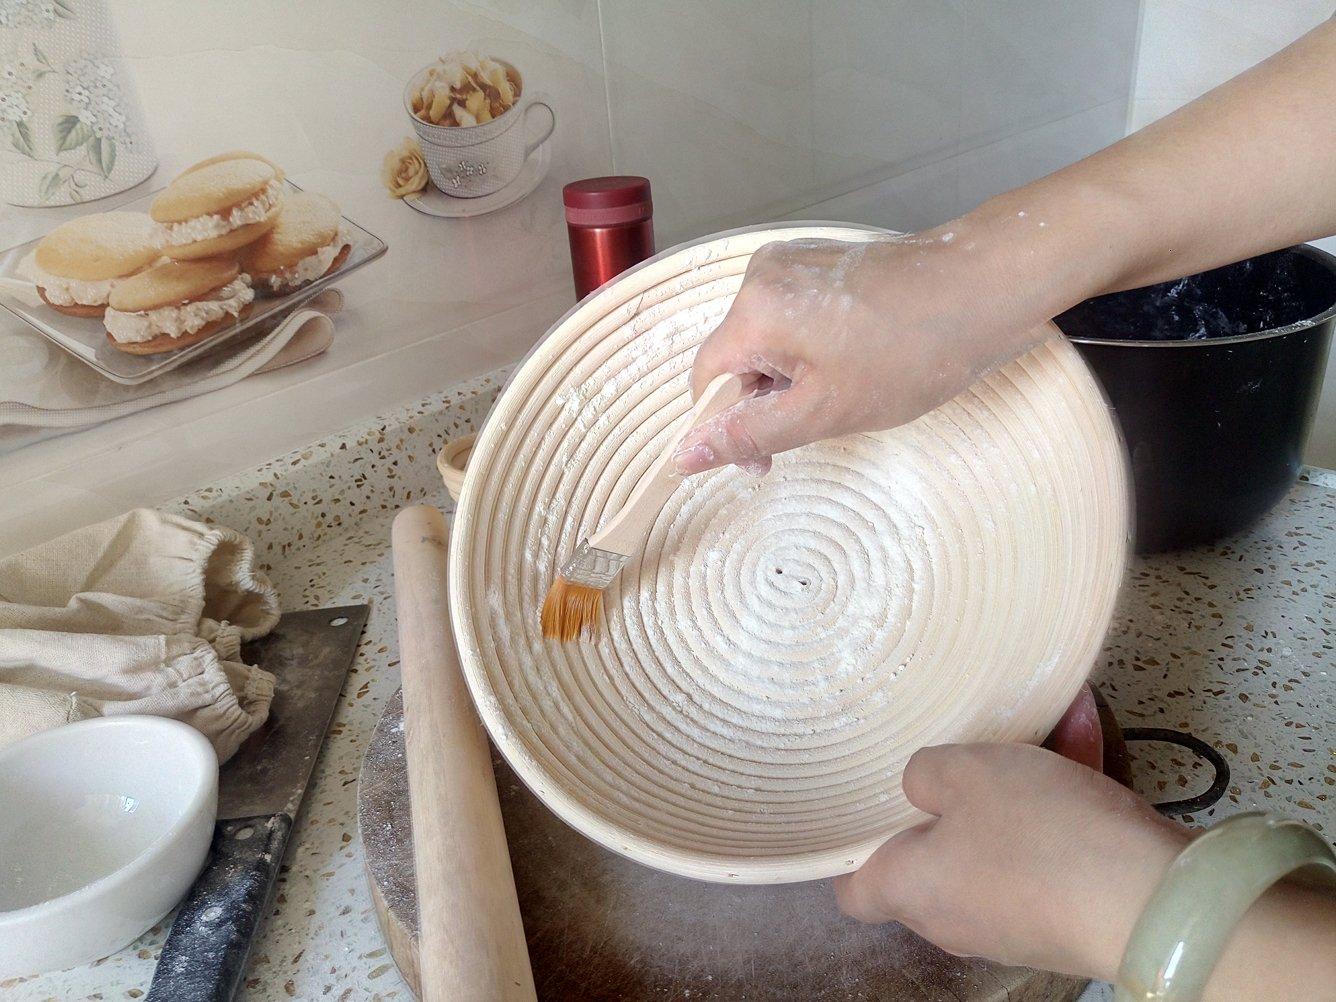 M JINGMEI Banneton Proofing Basket 10'' Round Banneton Brotform for Bread and Dough [Free Brush] Proofing Rising Rattan Bowl(1000g Dough) + Free Liner + Bread Lame by M JINGMEI (Image #3)